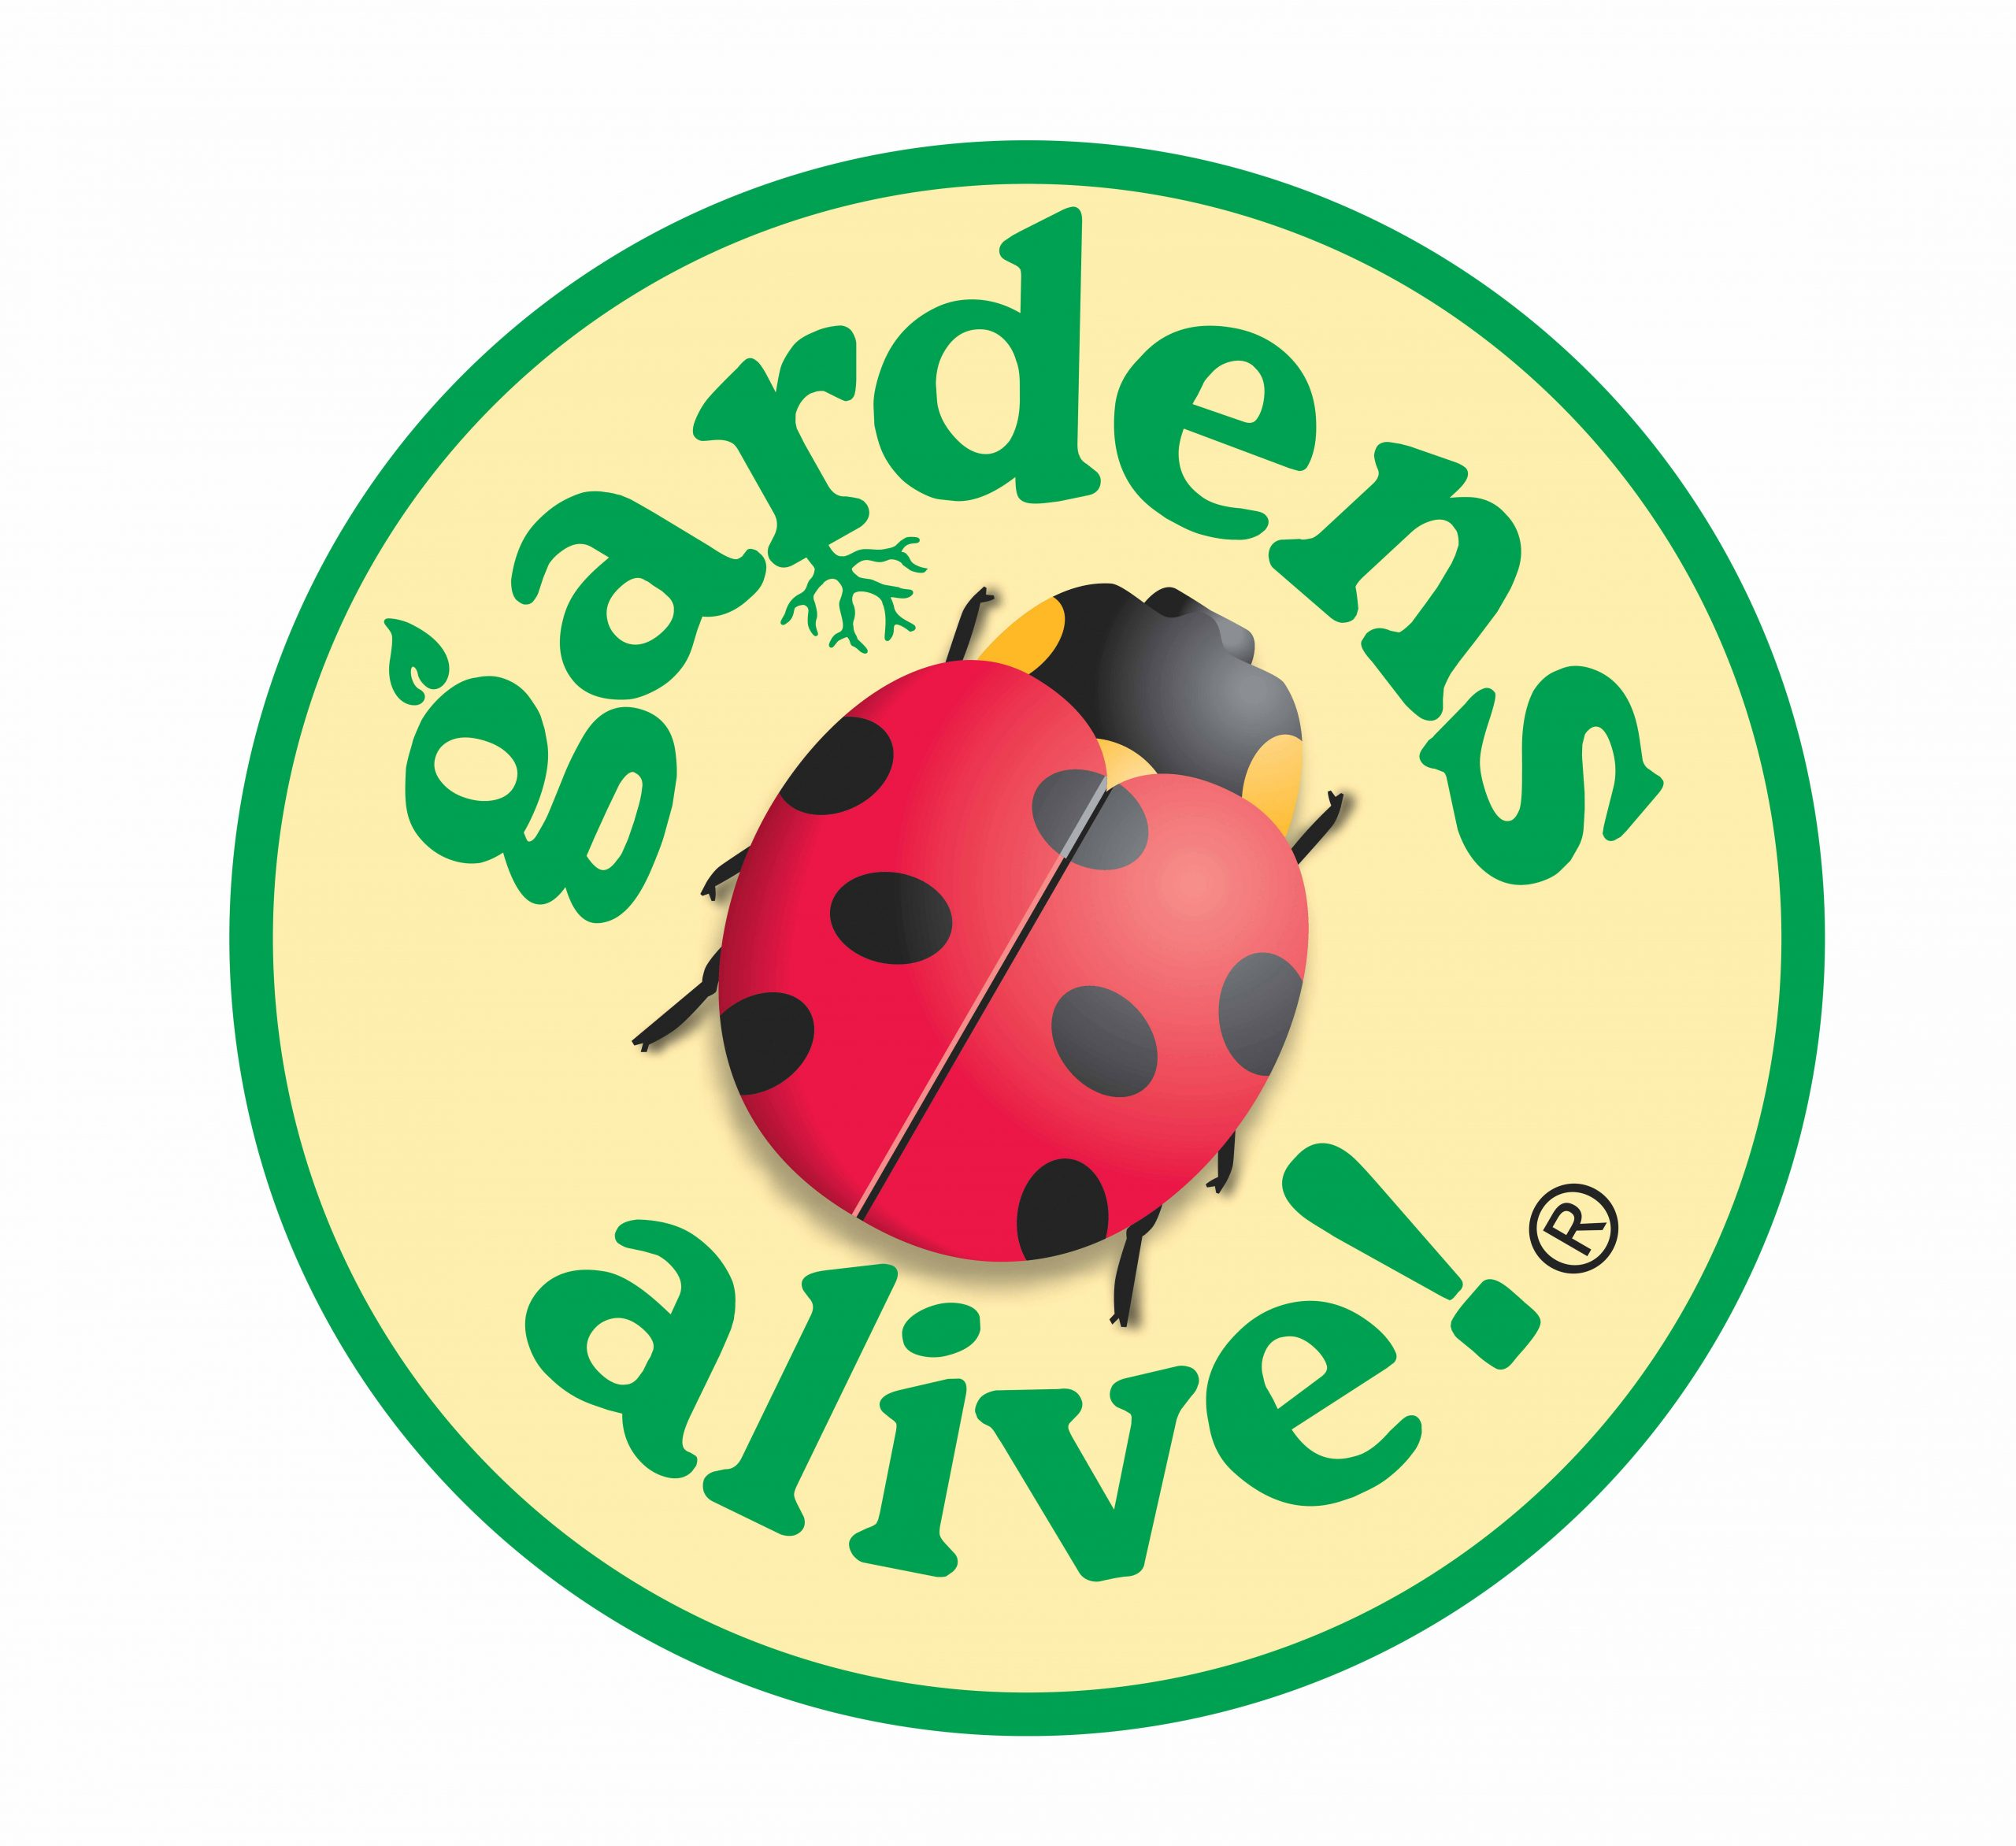 Gardens Alive! - National Garden Bureau